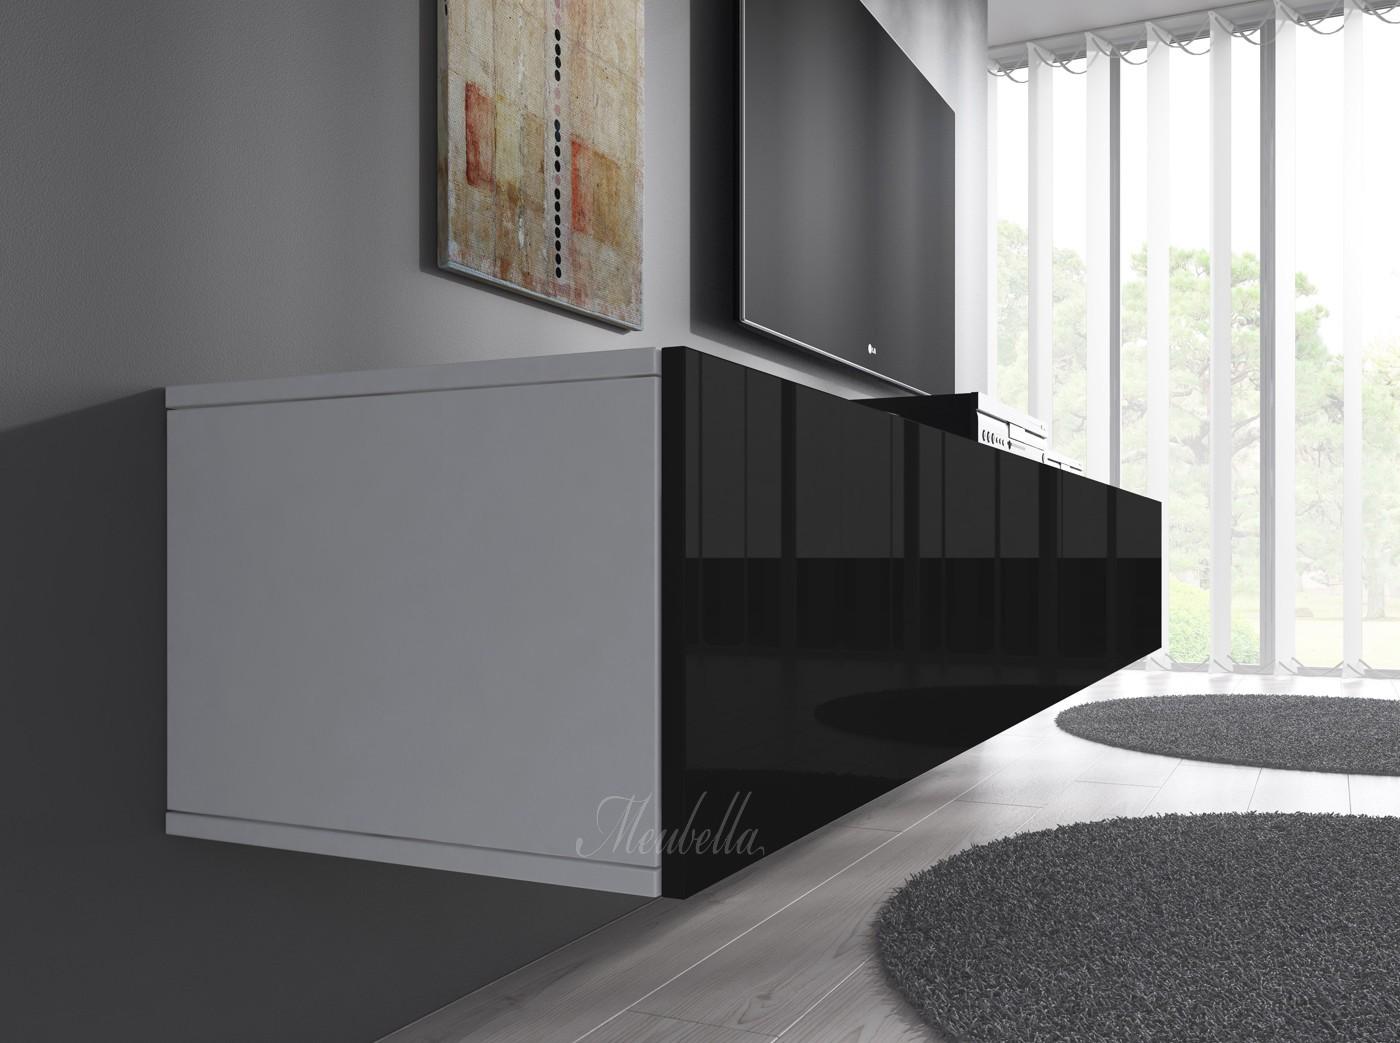 Tv meubel flame 3   xl   zwart   wit   200 cm   tv meubels ...